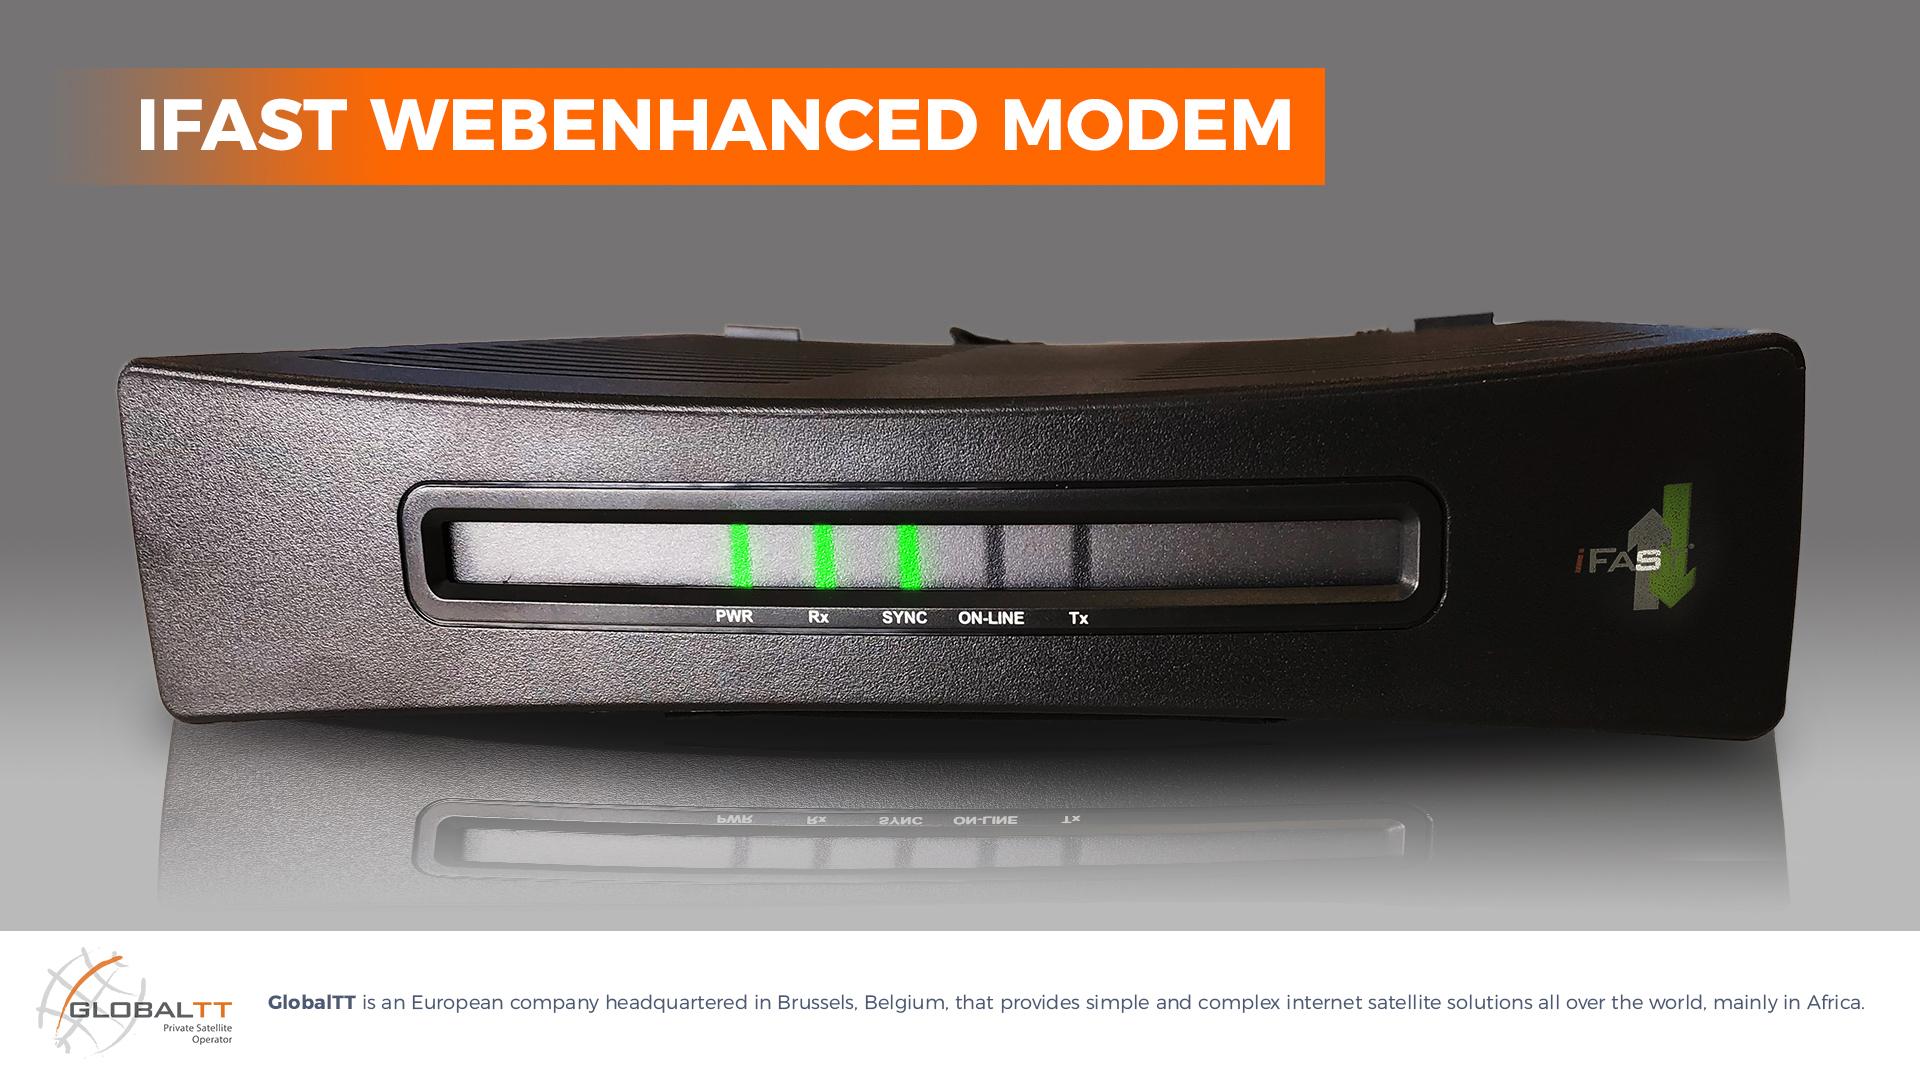 web enhance modem